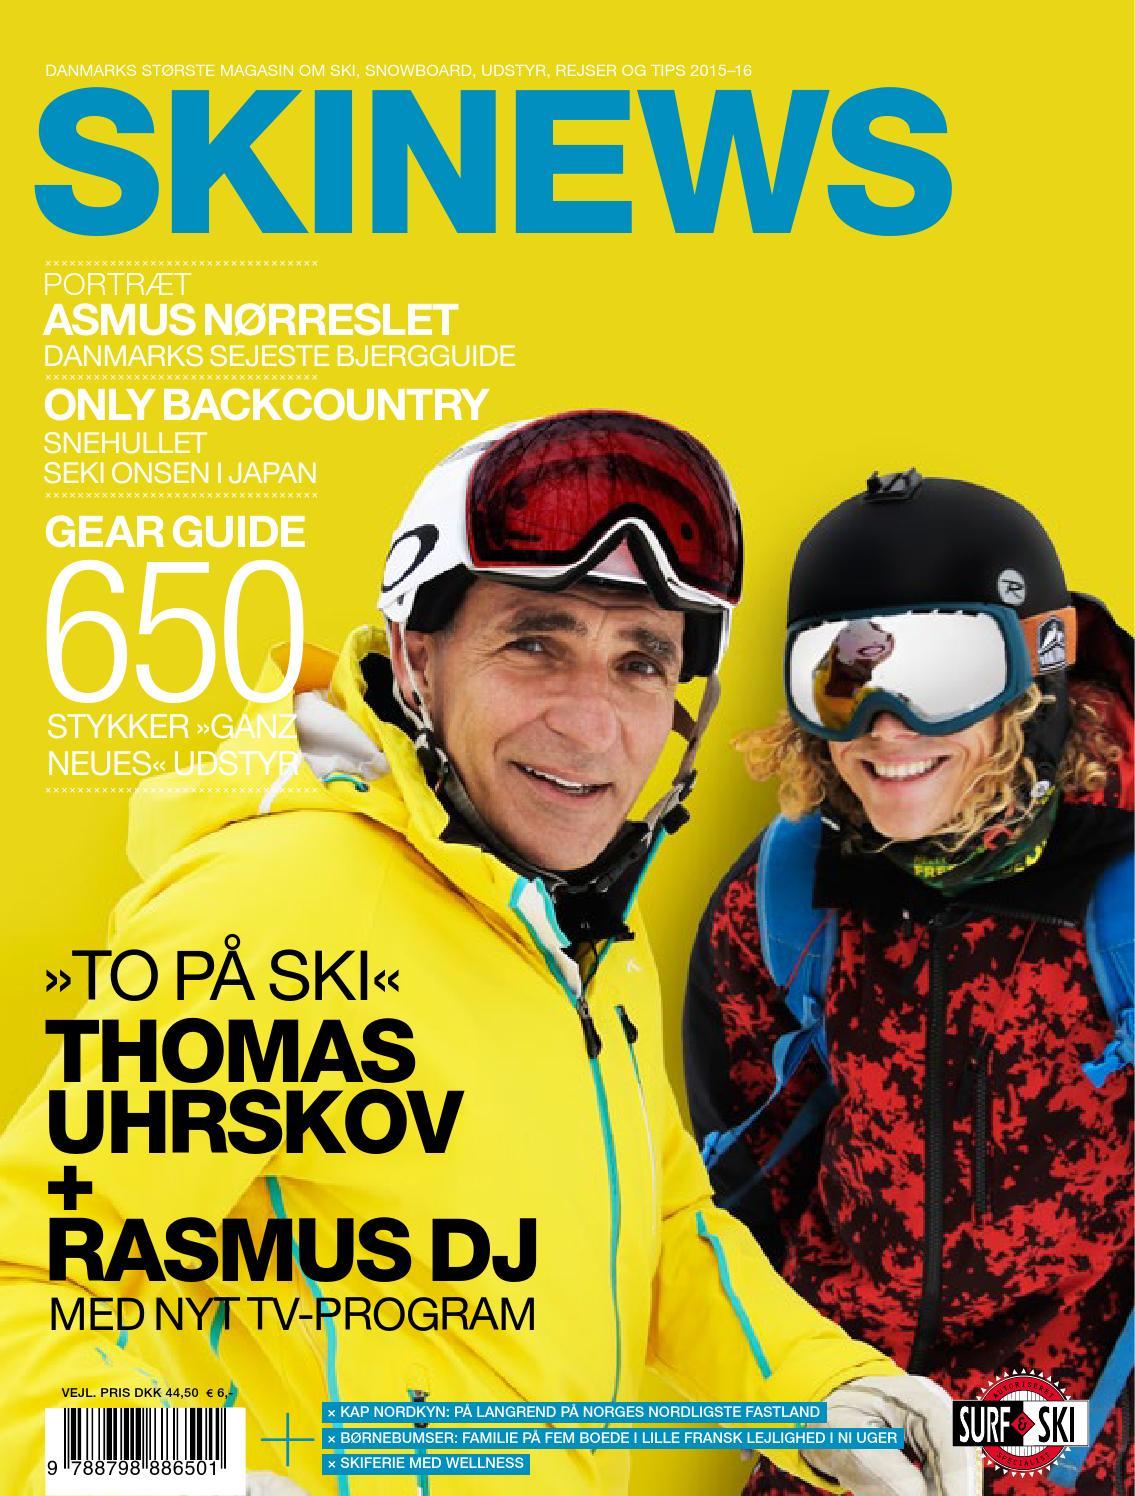 b4256086cd7 Skinews 2015 16 Surfline by Surf & Ski Danmark - issuu